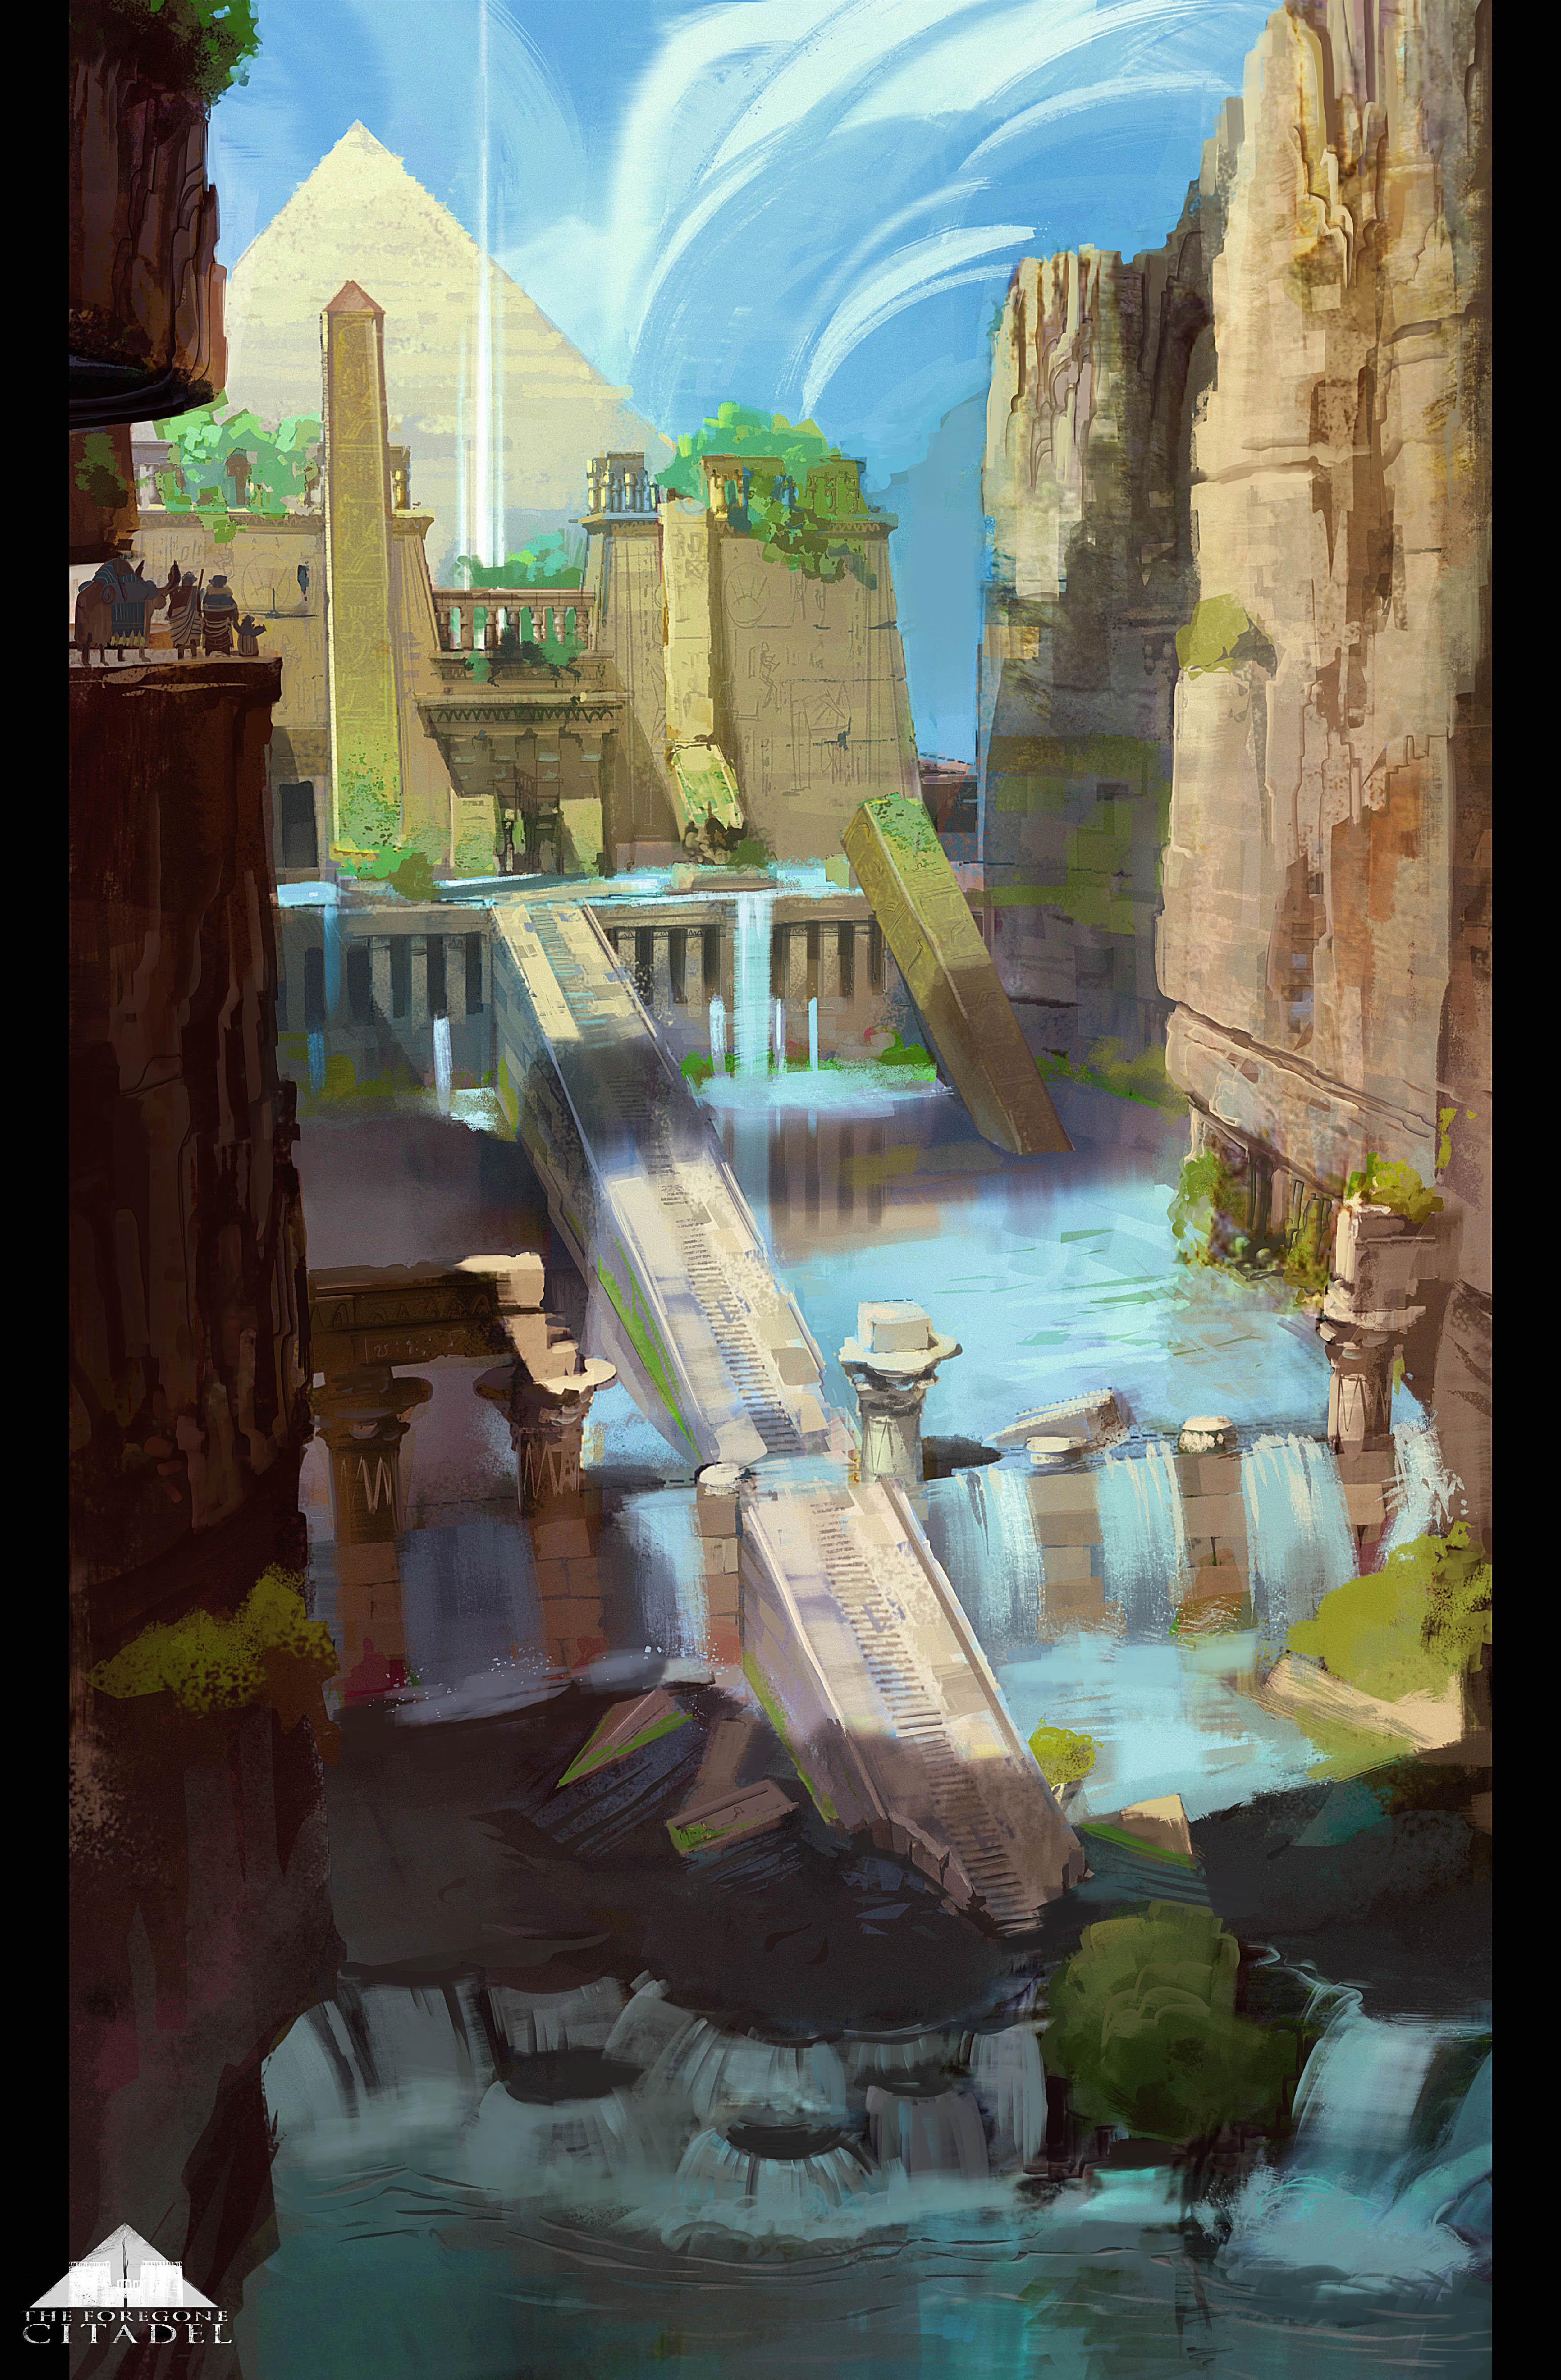 The Forgone Citadel.